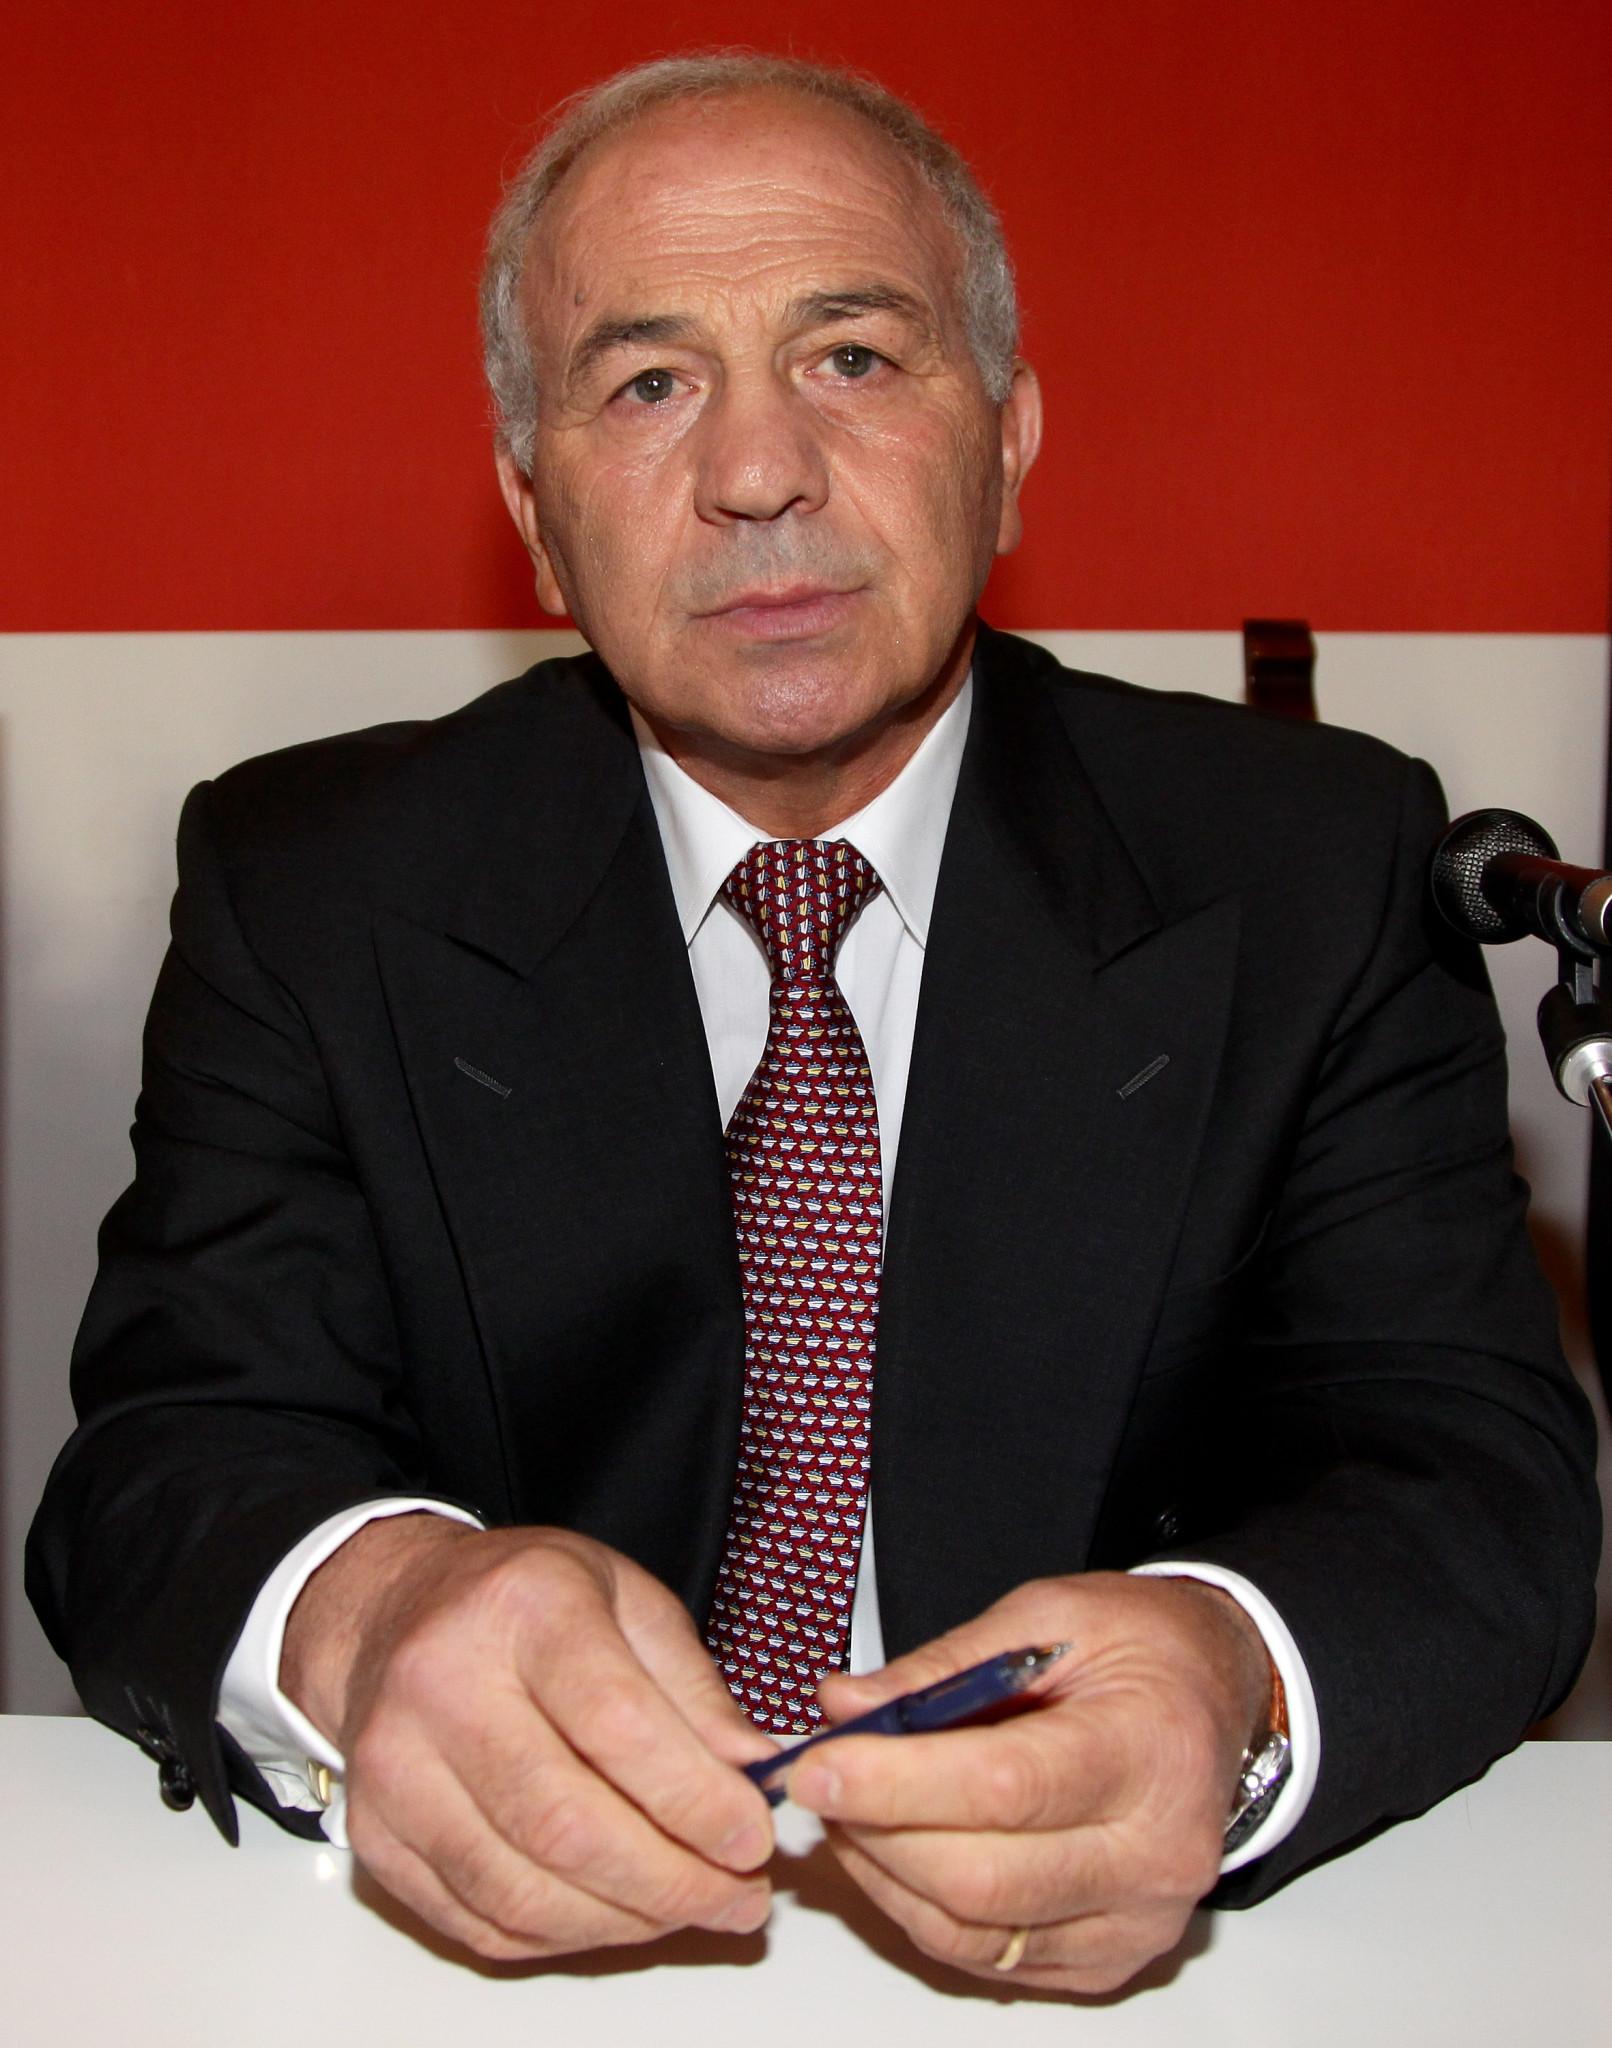 EUBC President Franco Falcinelli said he was